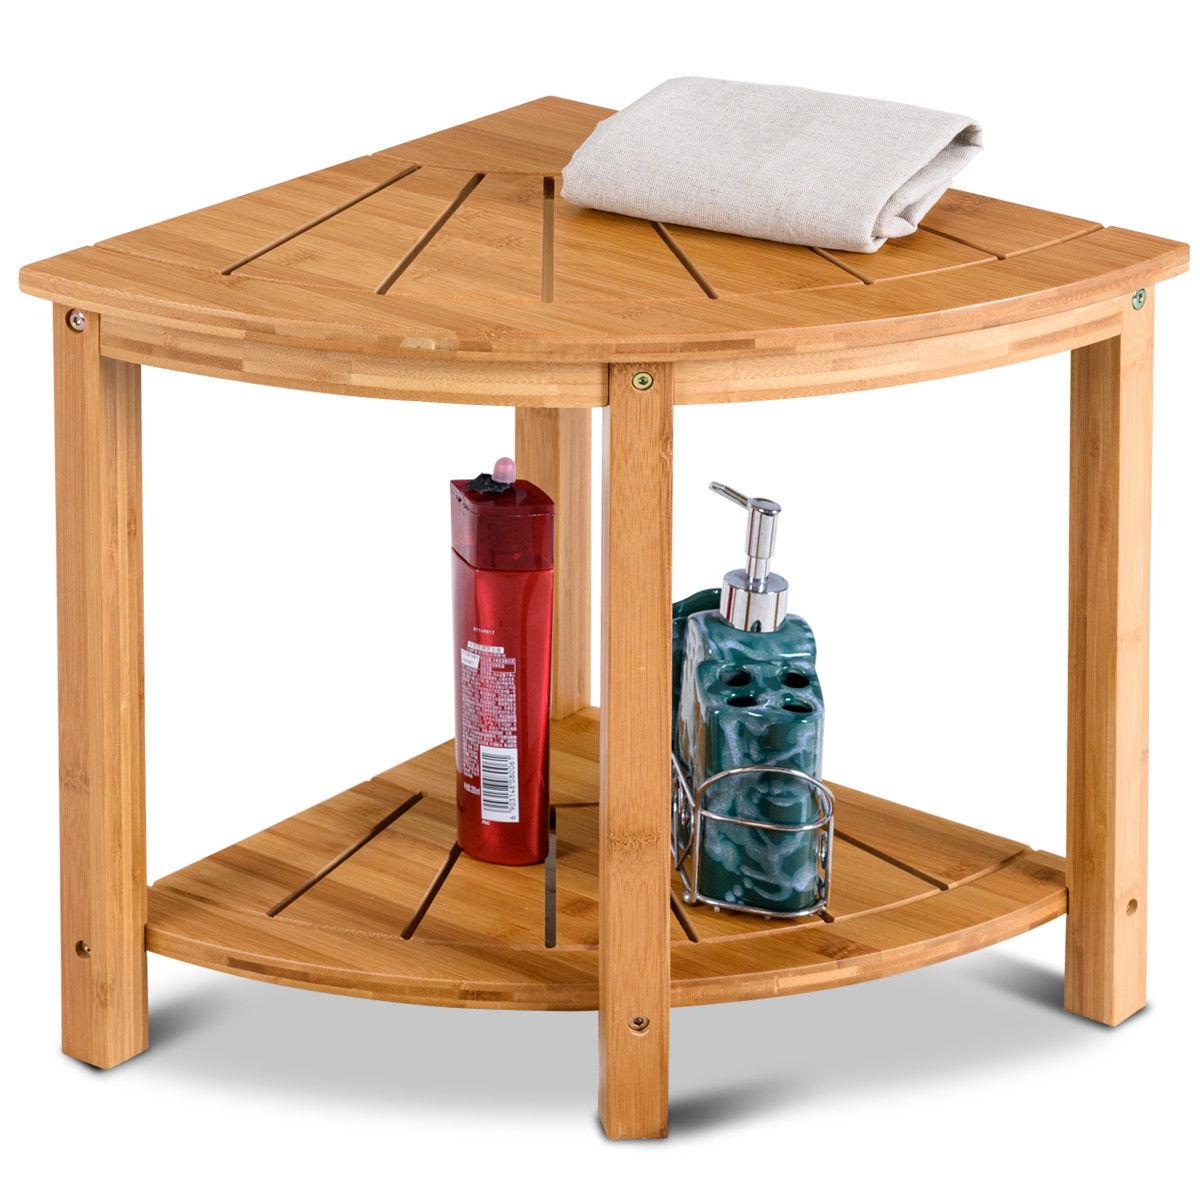 Gymax Shower Beach Bamboo Spa Seat Stool Bathroom Organizer w Storage Shelf by Gymax